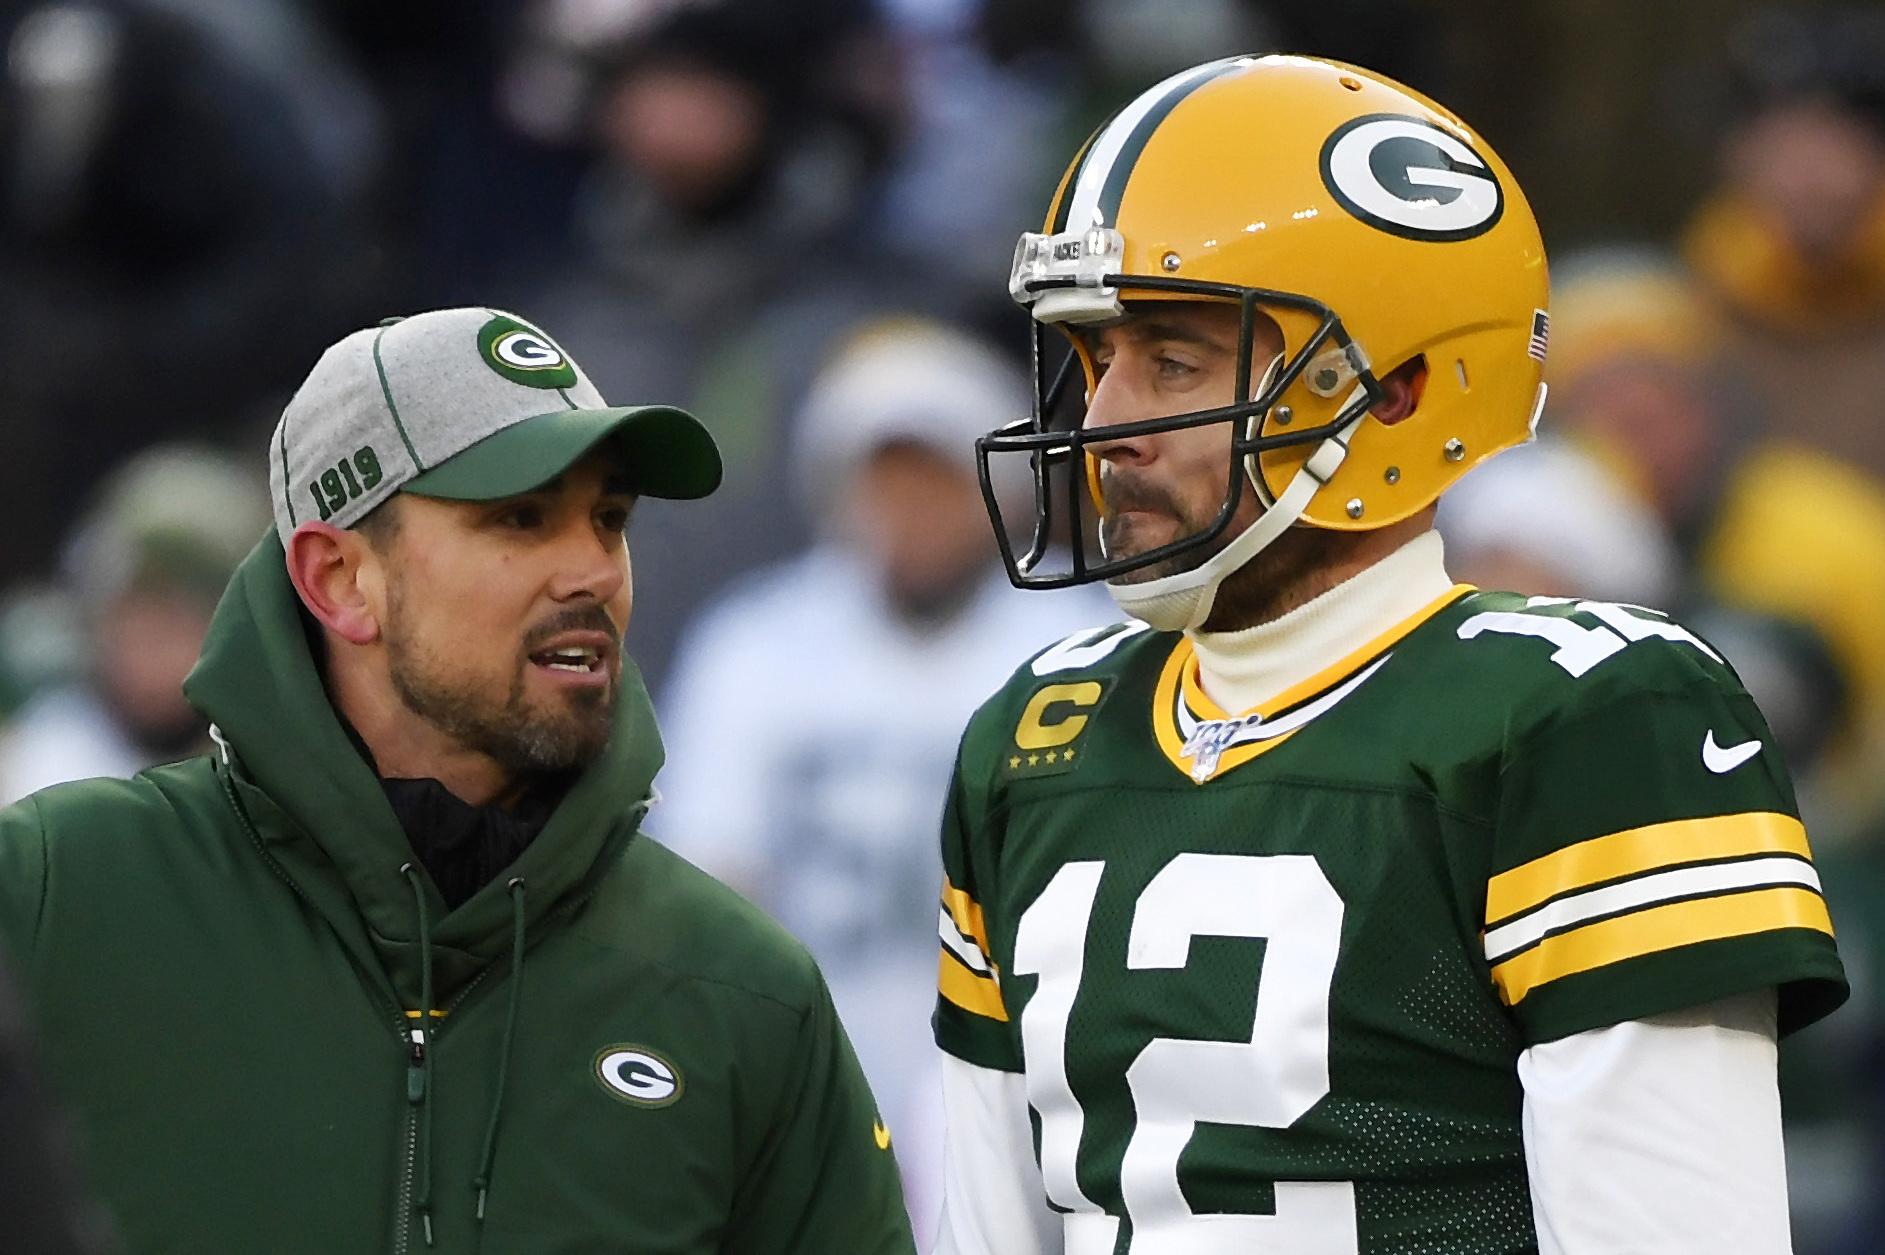 Longtime Packers Writer: 'My Sense' Matt LaFleur Tiring of Aaron Rodgers' 'Act' | Bleacher Report | Latest News, Videos and Highlights